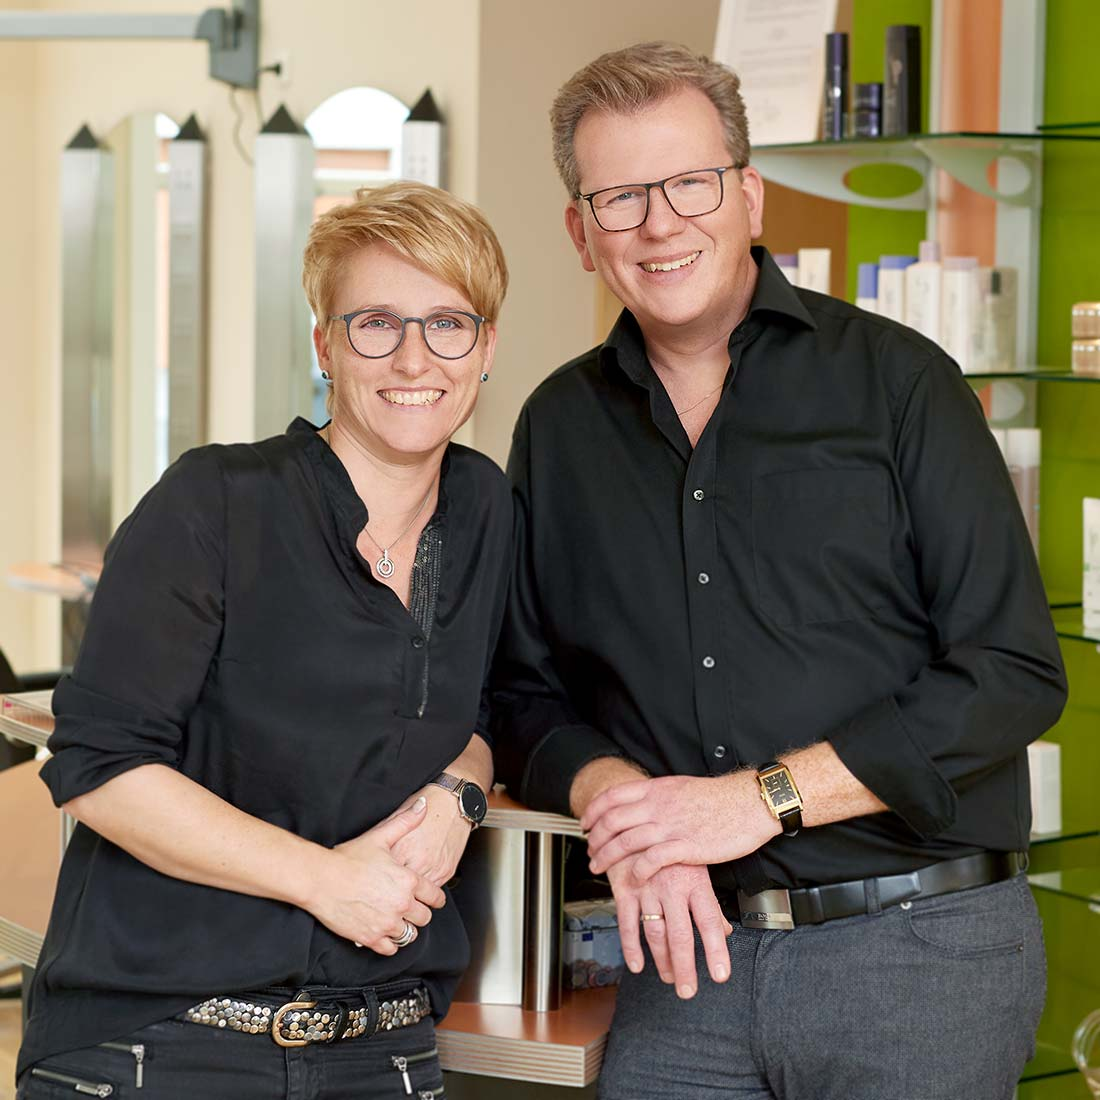 Corporate Portraitfoto Thorsten und Sandra Klees, Meudt